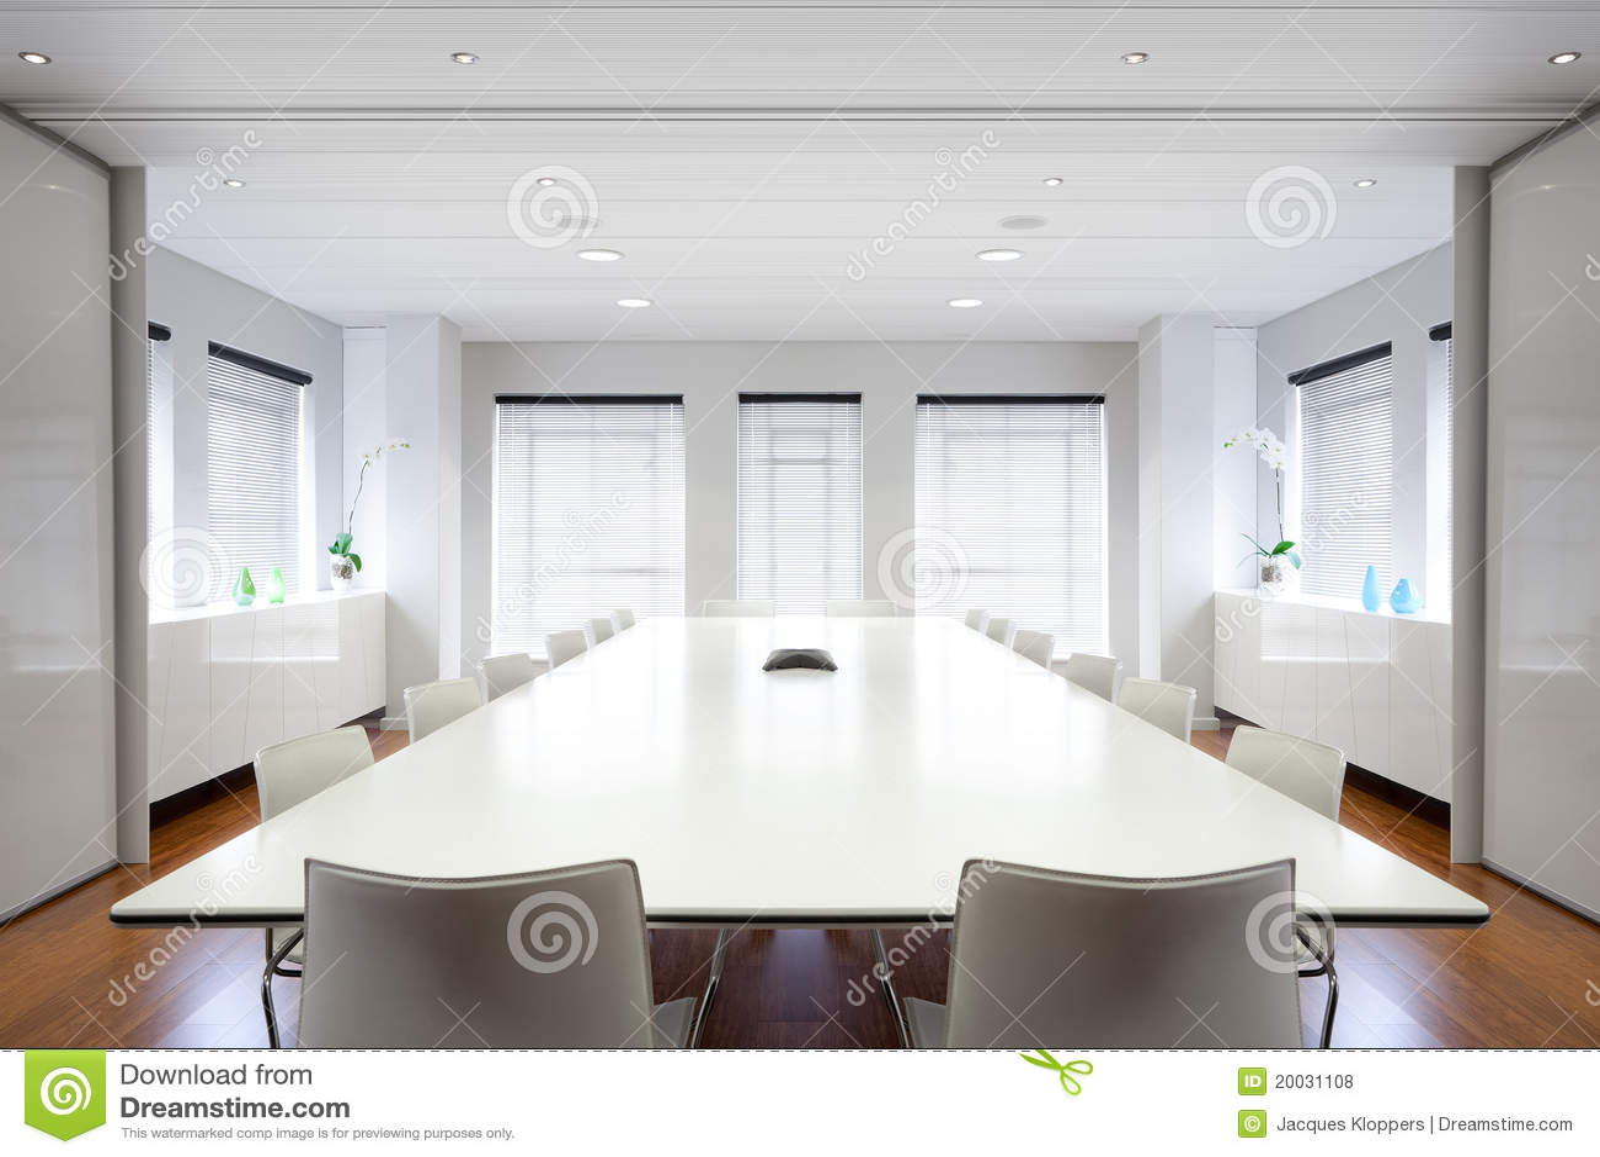 Moderne bureaubestuurskamer die met licht wordt gevuld.